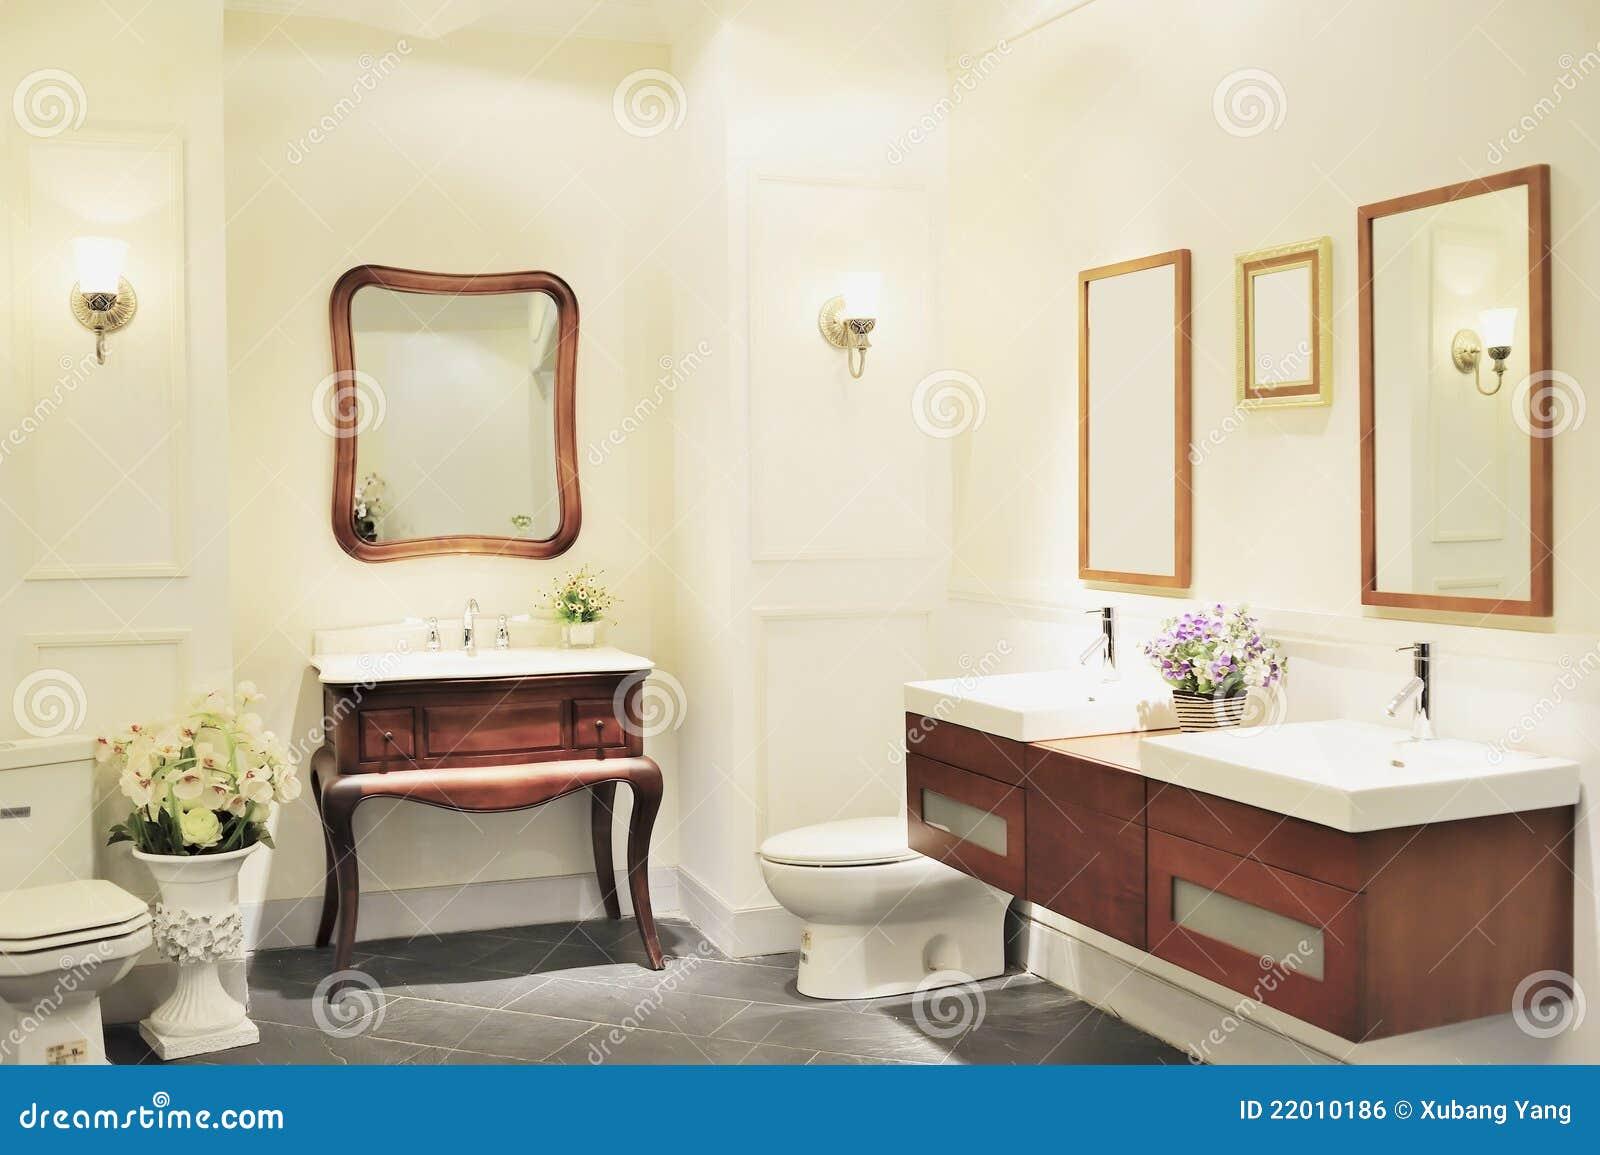 Salle De Bain Fleurie ~ salle de bains de luxe photo stock image du cher inside 22010186